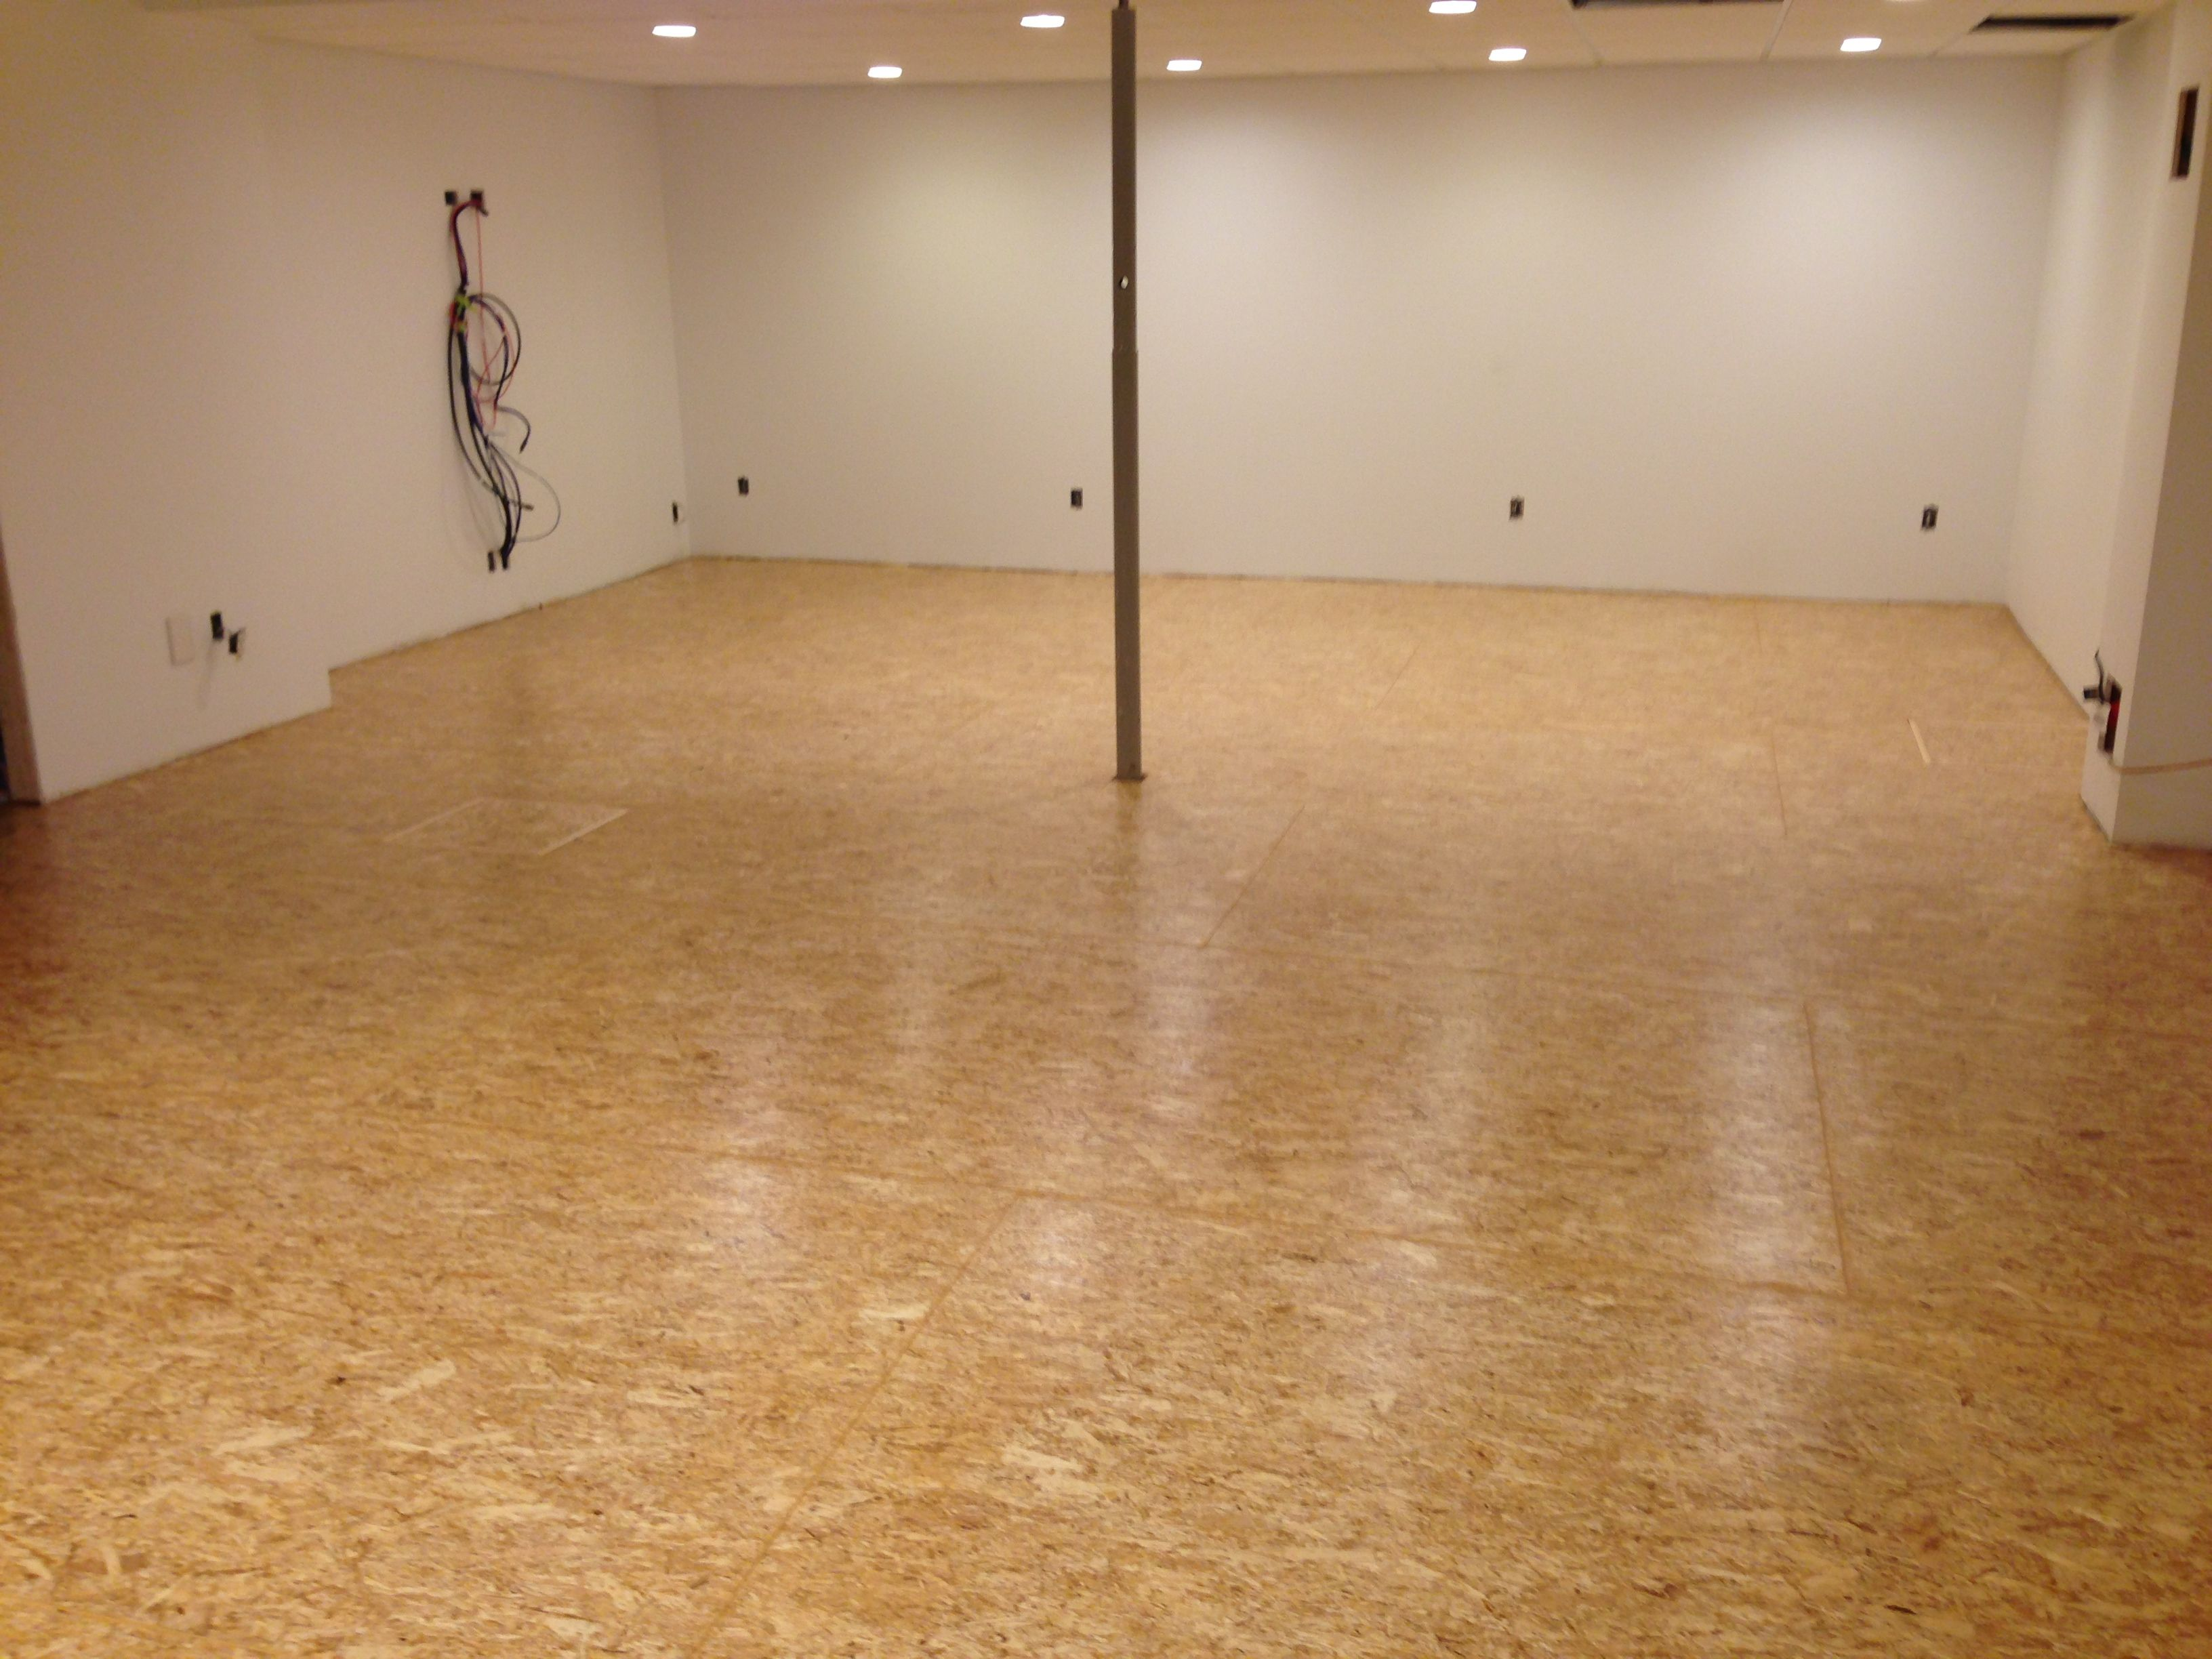 Using OSB Flooring over dimple board over basement slab